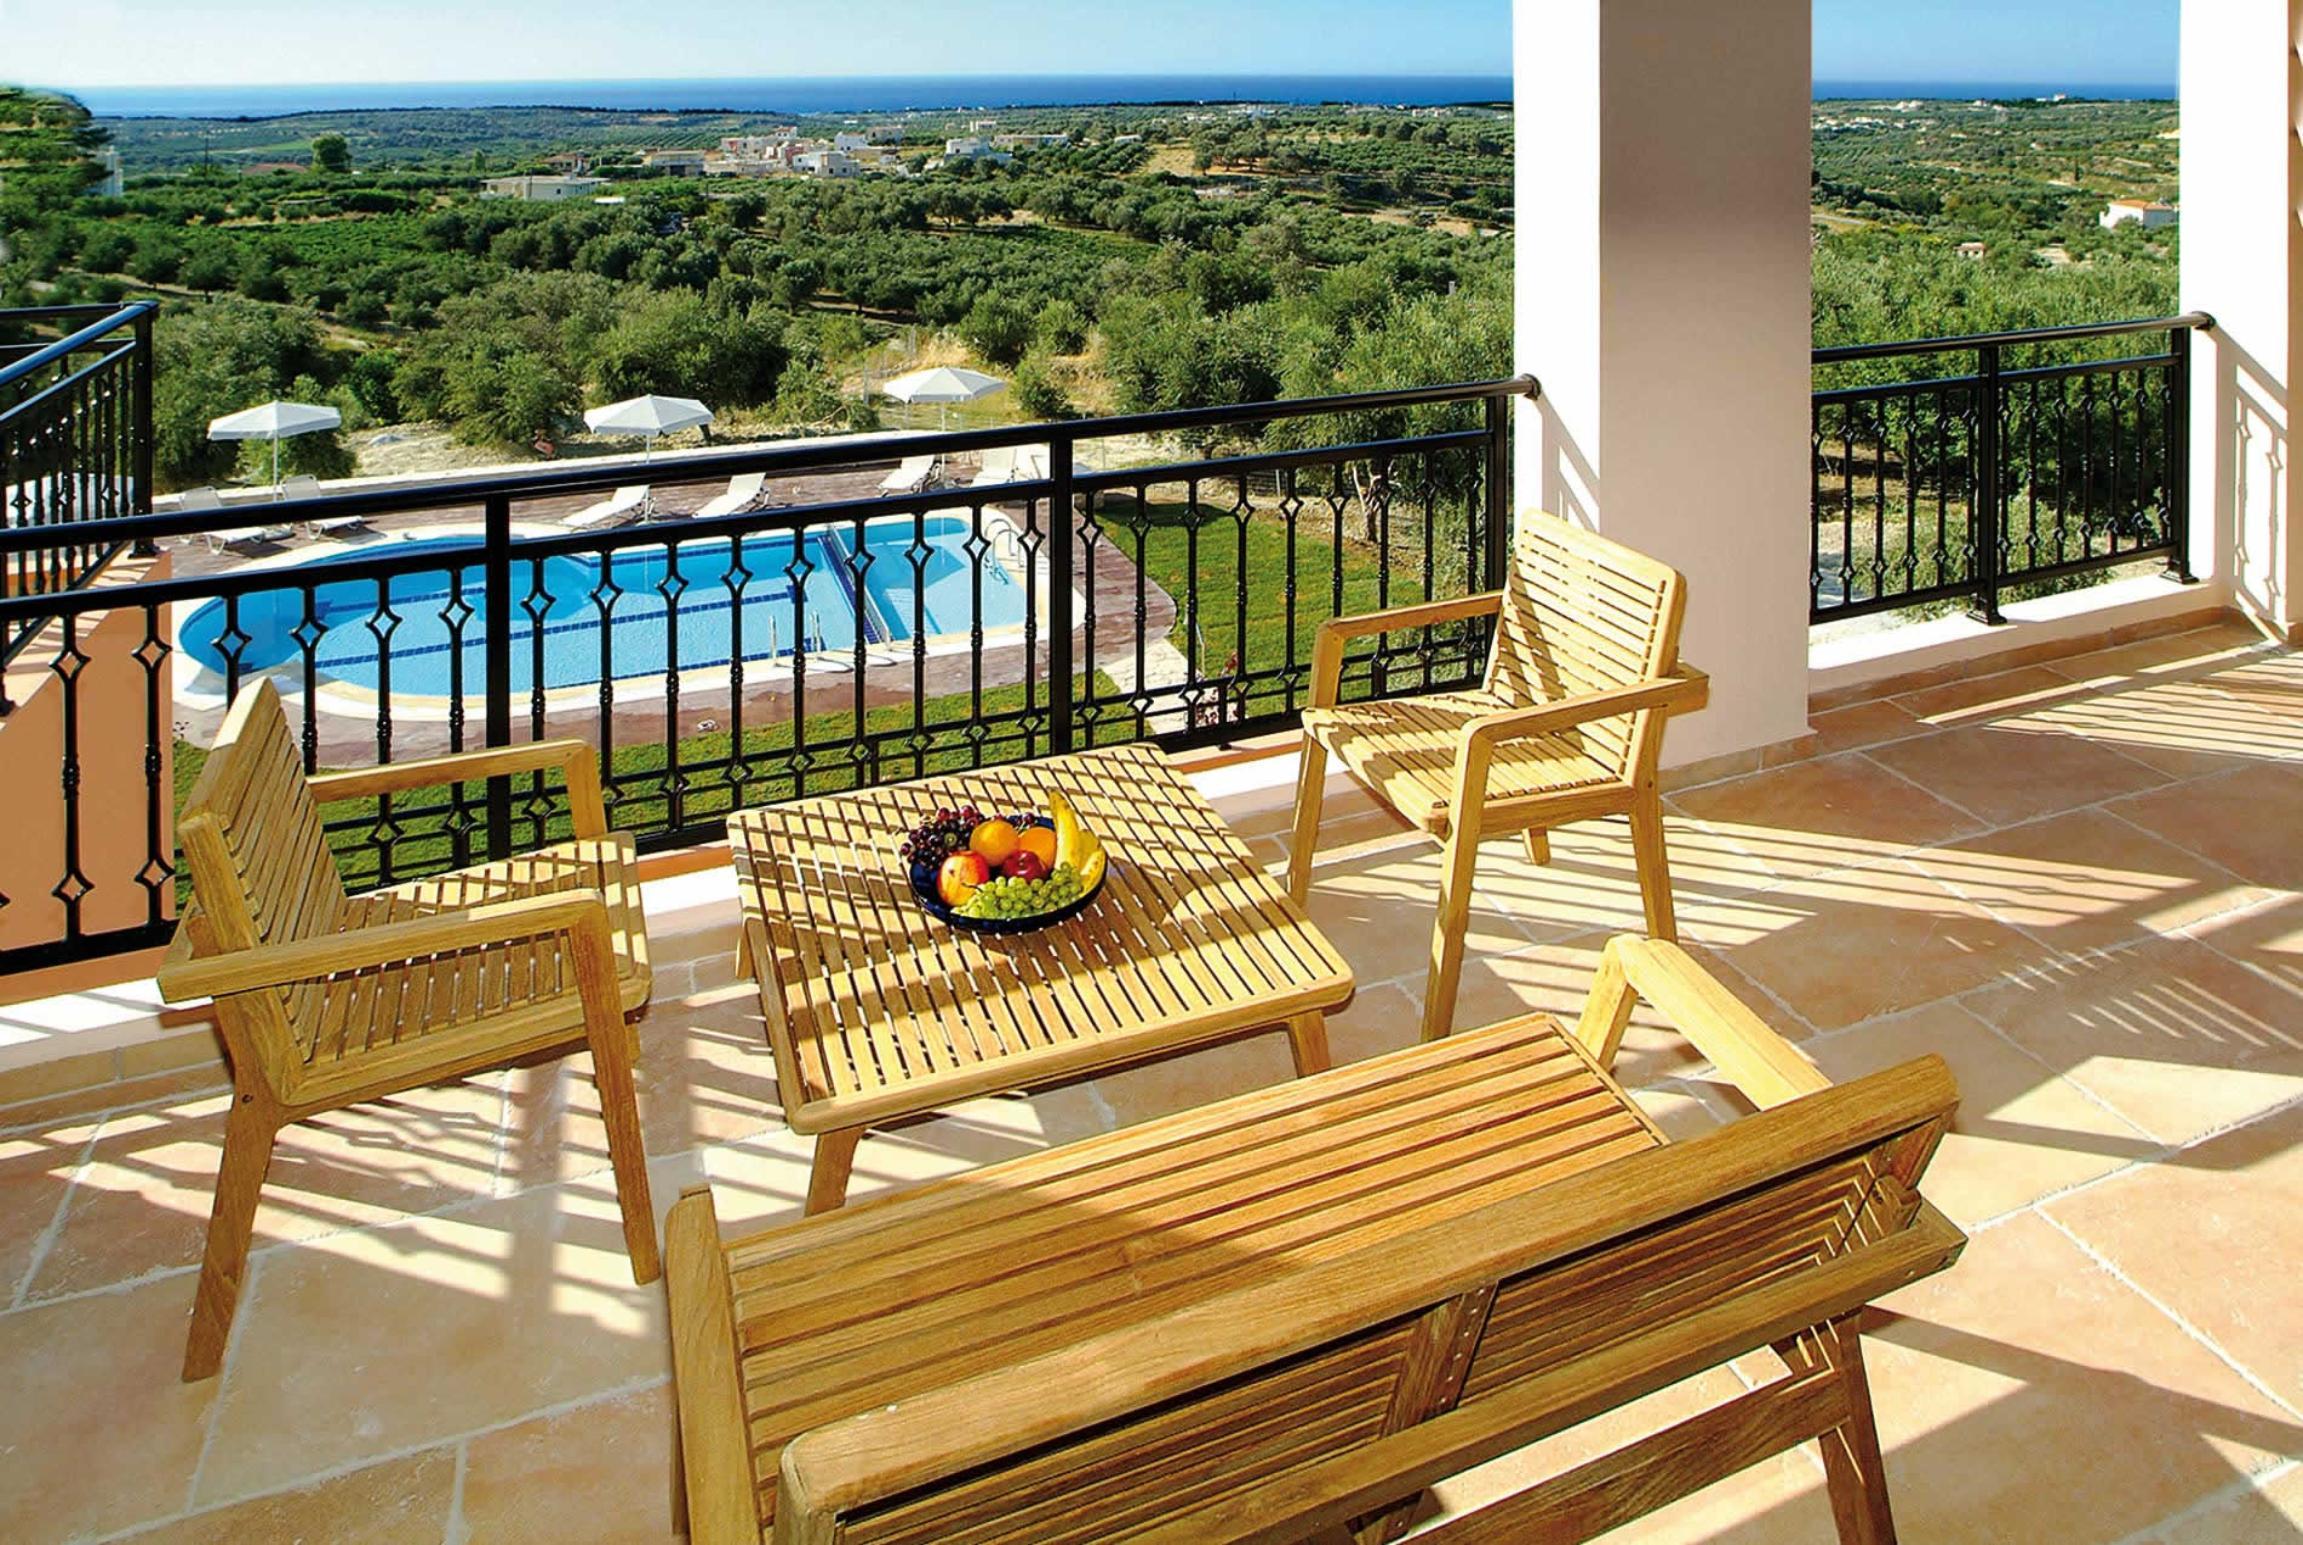 Ferienhaus Kyveli (2654321), Rethymno, Kreta Nordküste, Kreta, Griechenland, Bild 13